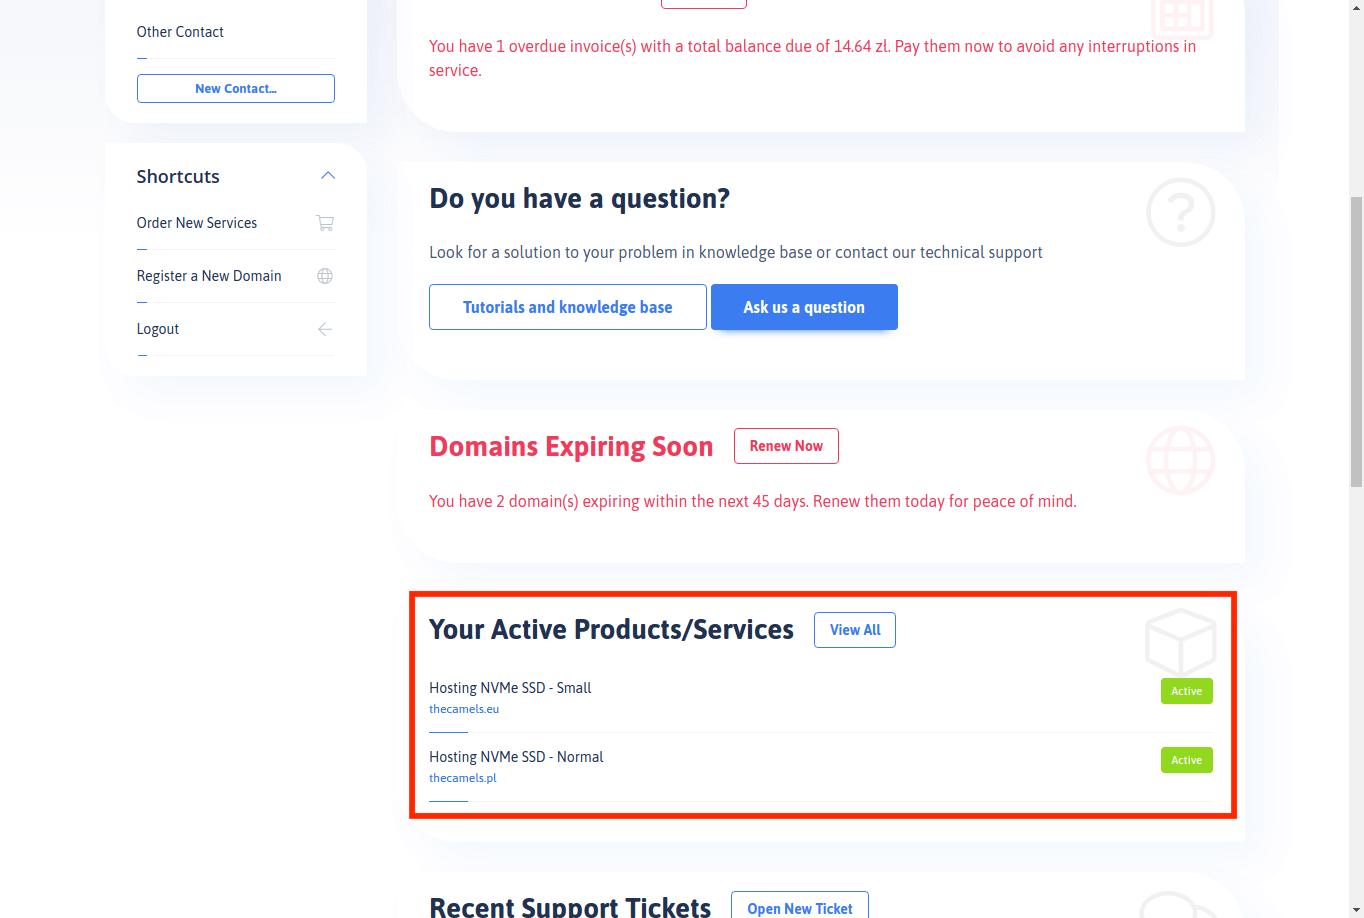 Ordering an additional address/IP range - step 1